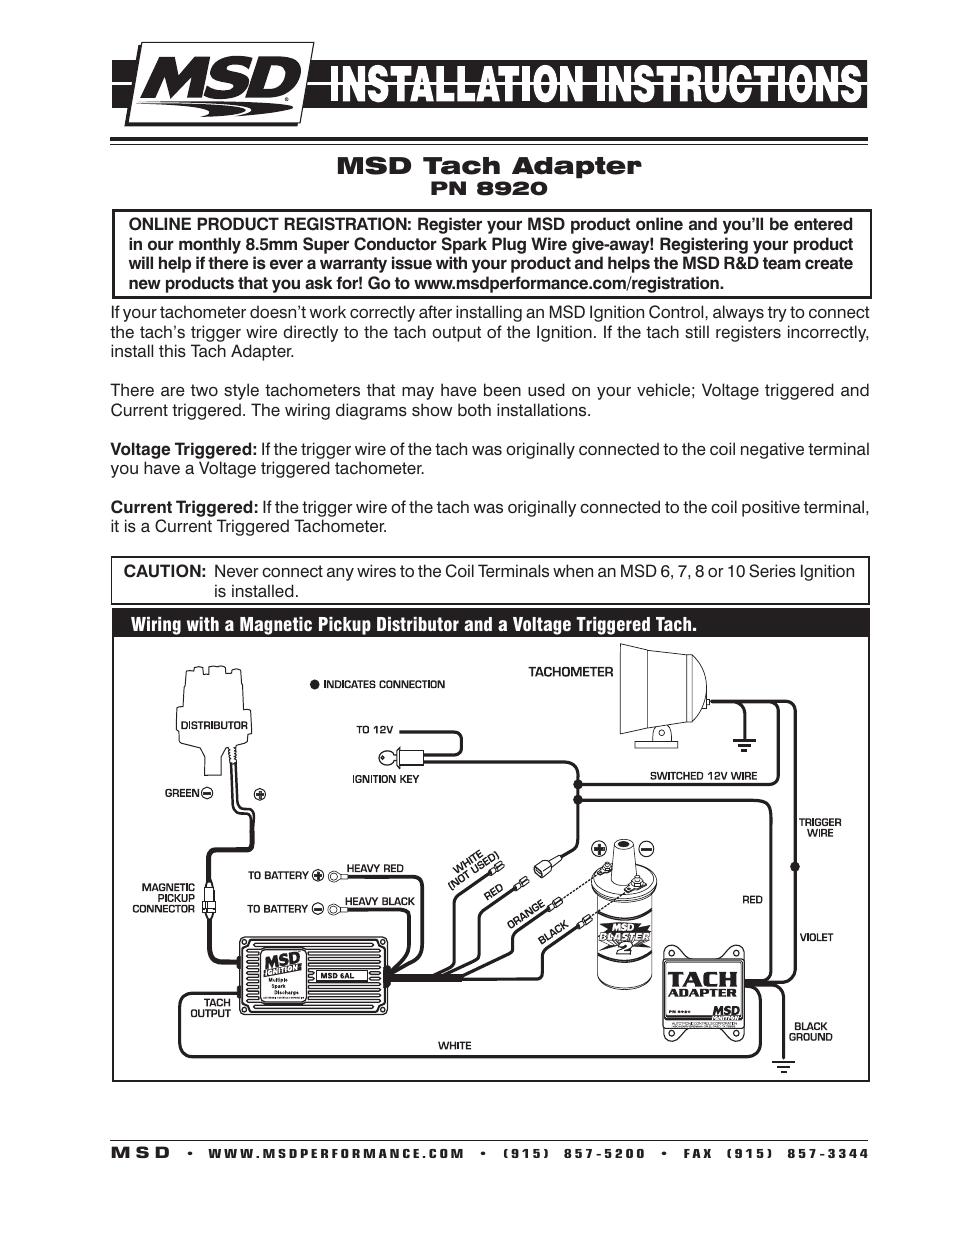 Sunpro Tach Wiring Diagram Race Car Wiring Diagram • Wiring ...